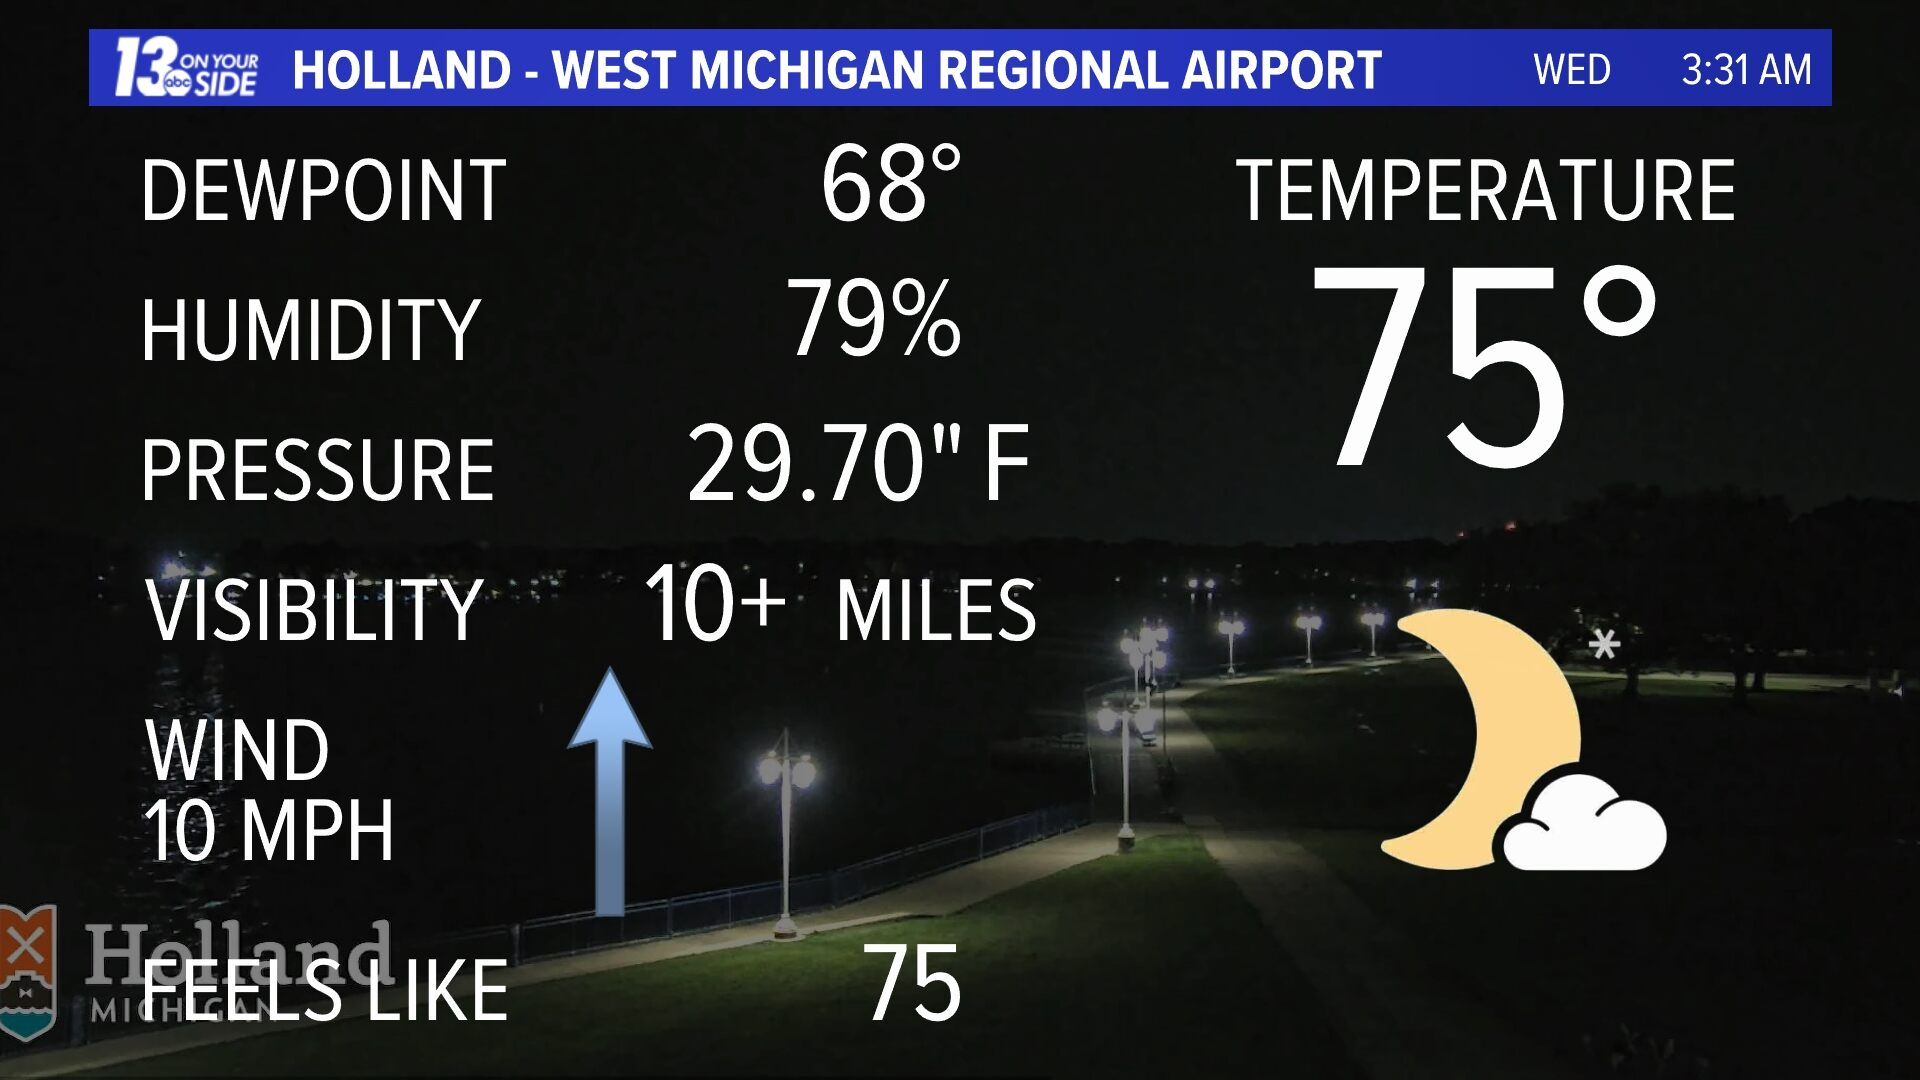 Holland-West Michigan Regional Airport